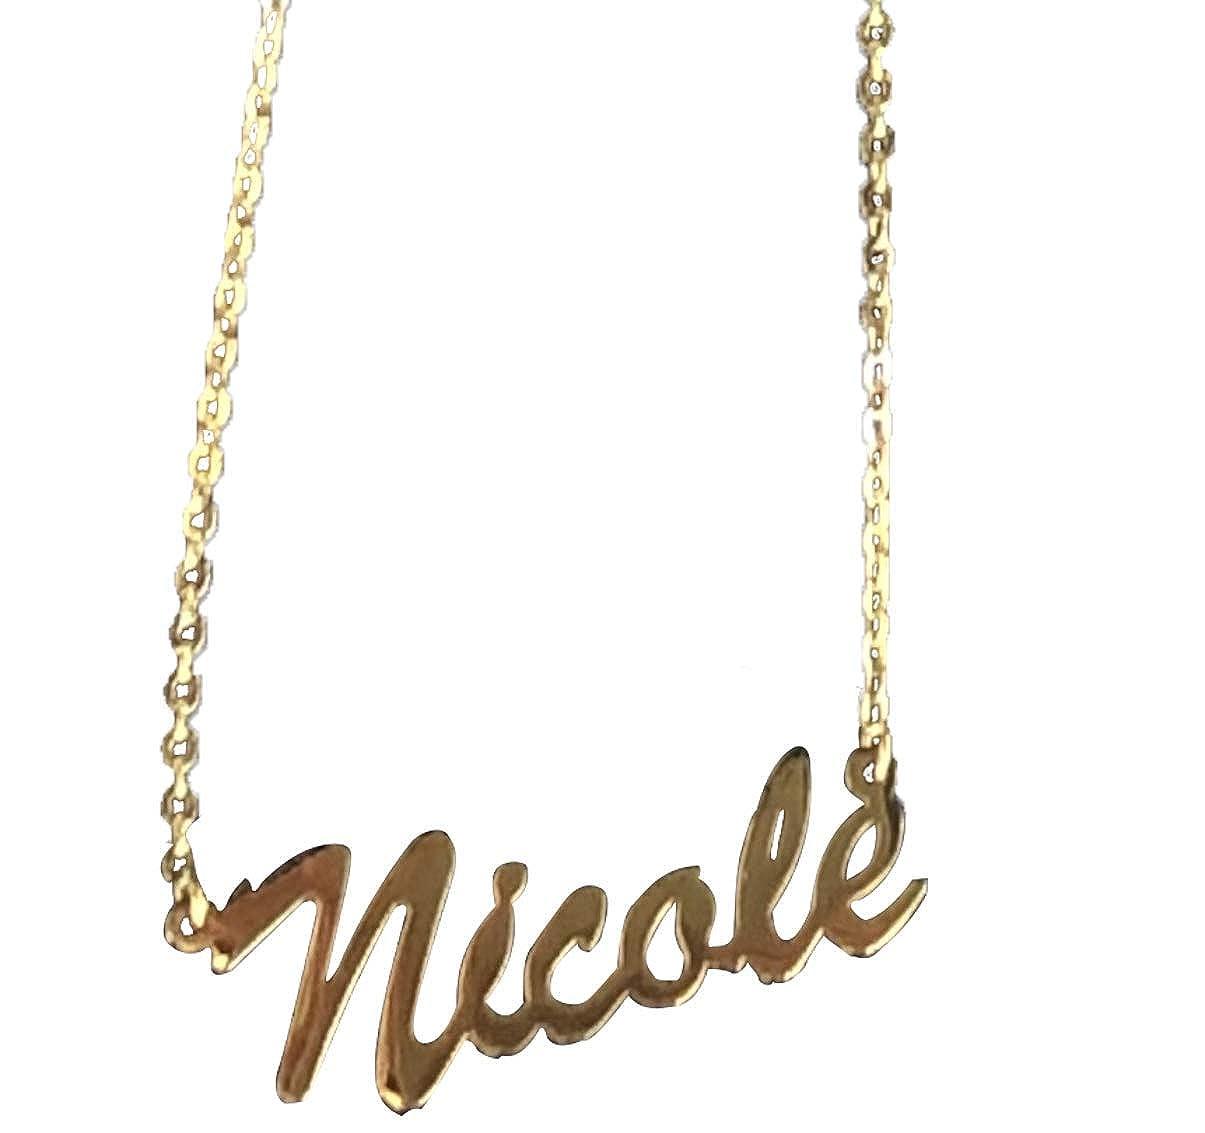 f239347818e88 Amazon.com: Foreverlove Personalized Name Necklace Nicole Pendant ...